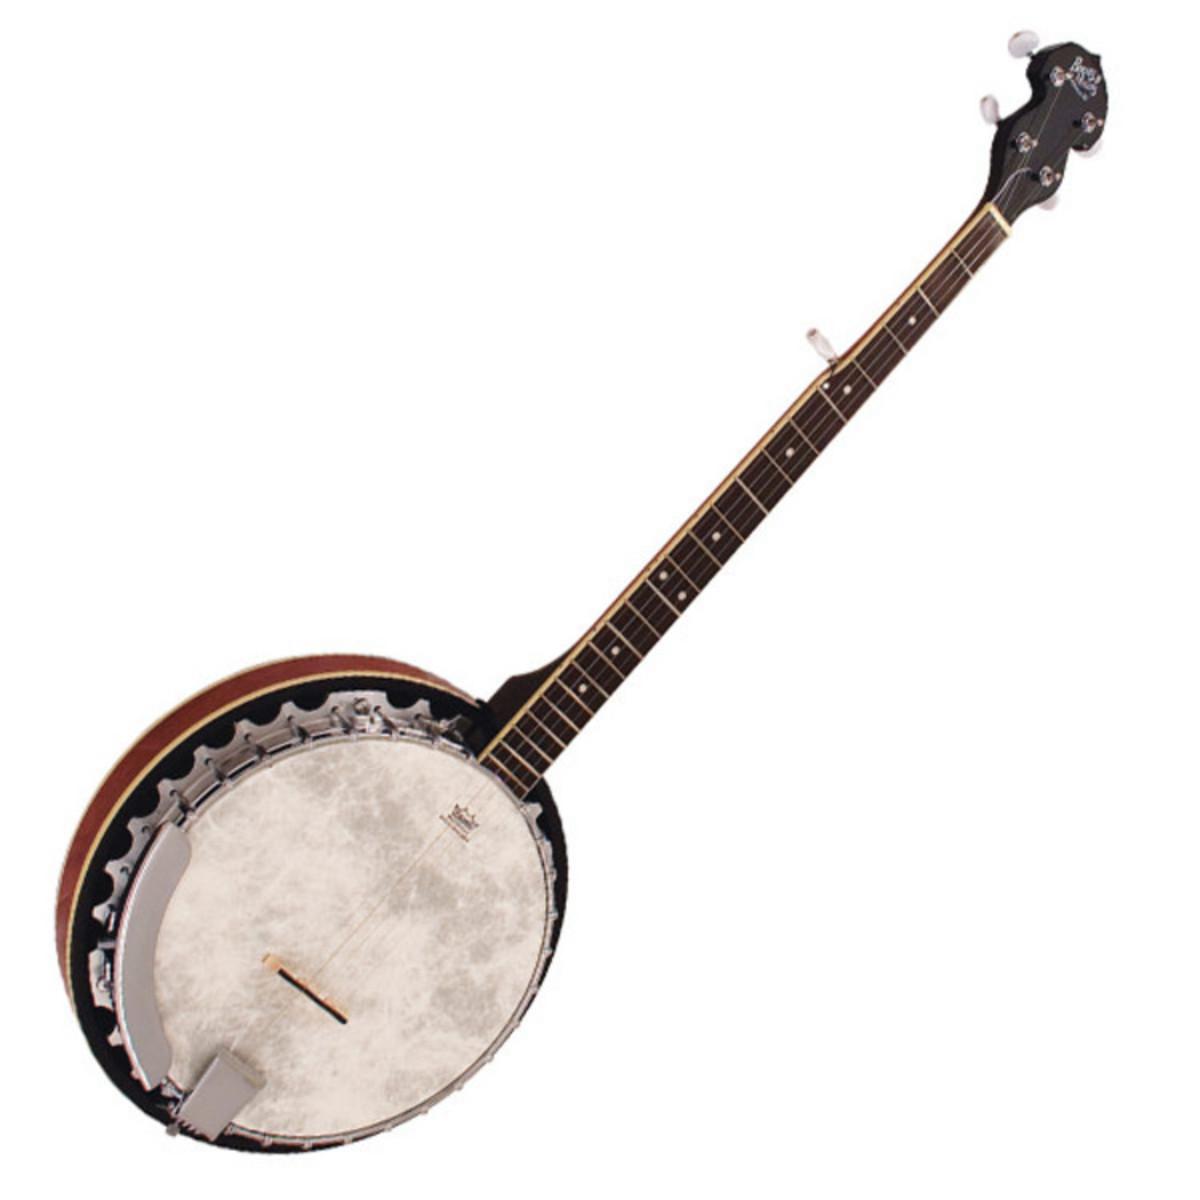 Barnes & Mullins BJ300 Perfect 5 String Banjo at Gear4music